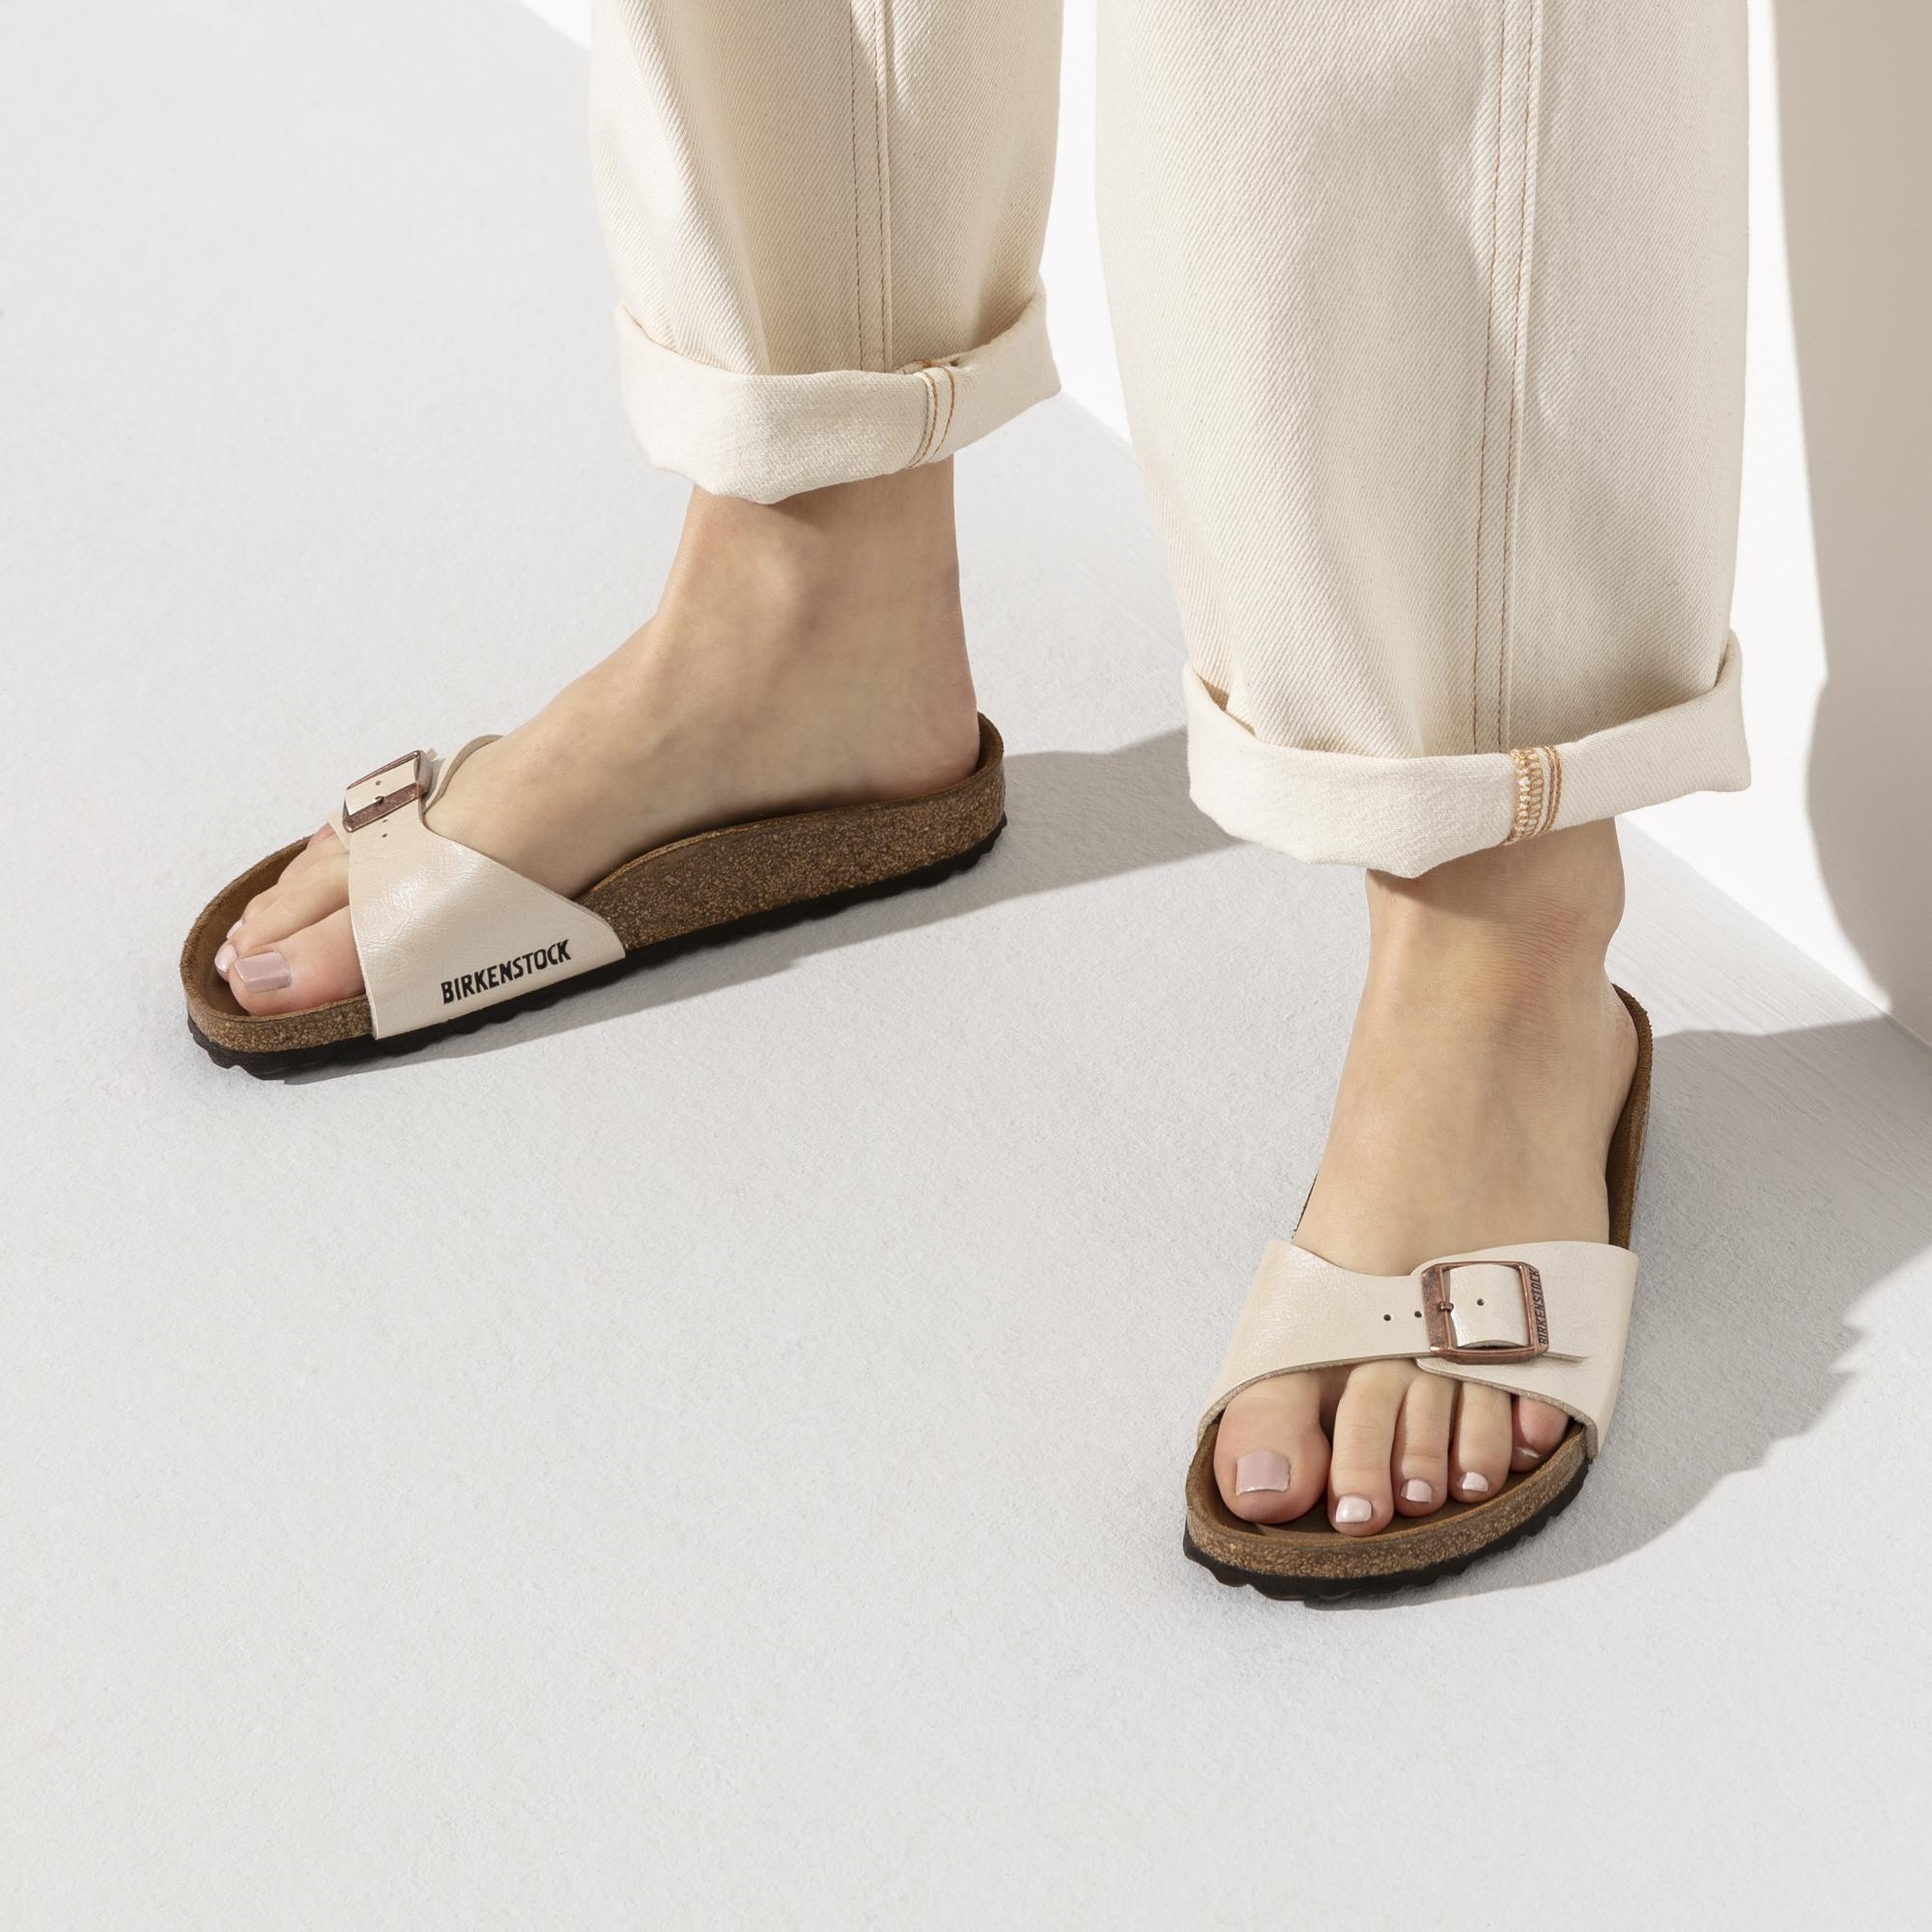 Birkenstock SandalsWhiteGraceful Fashion Birkenstock